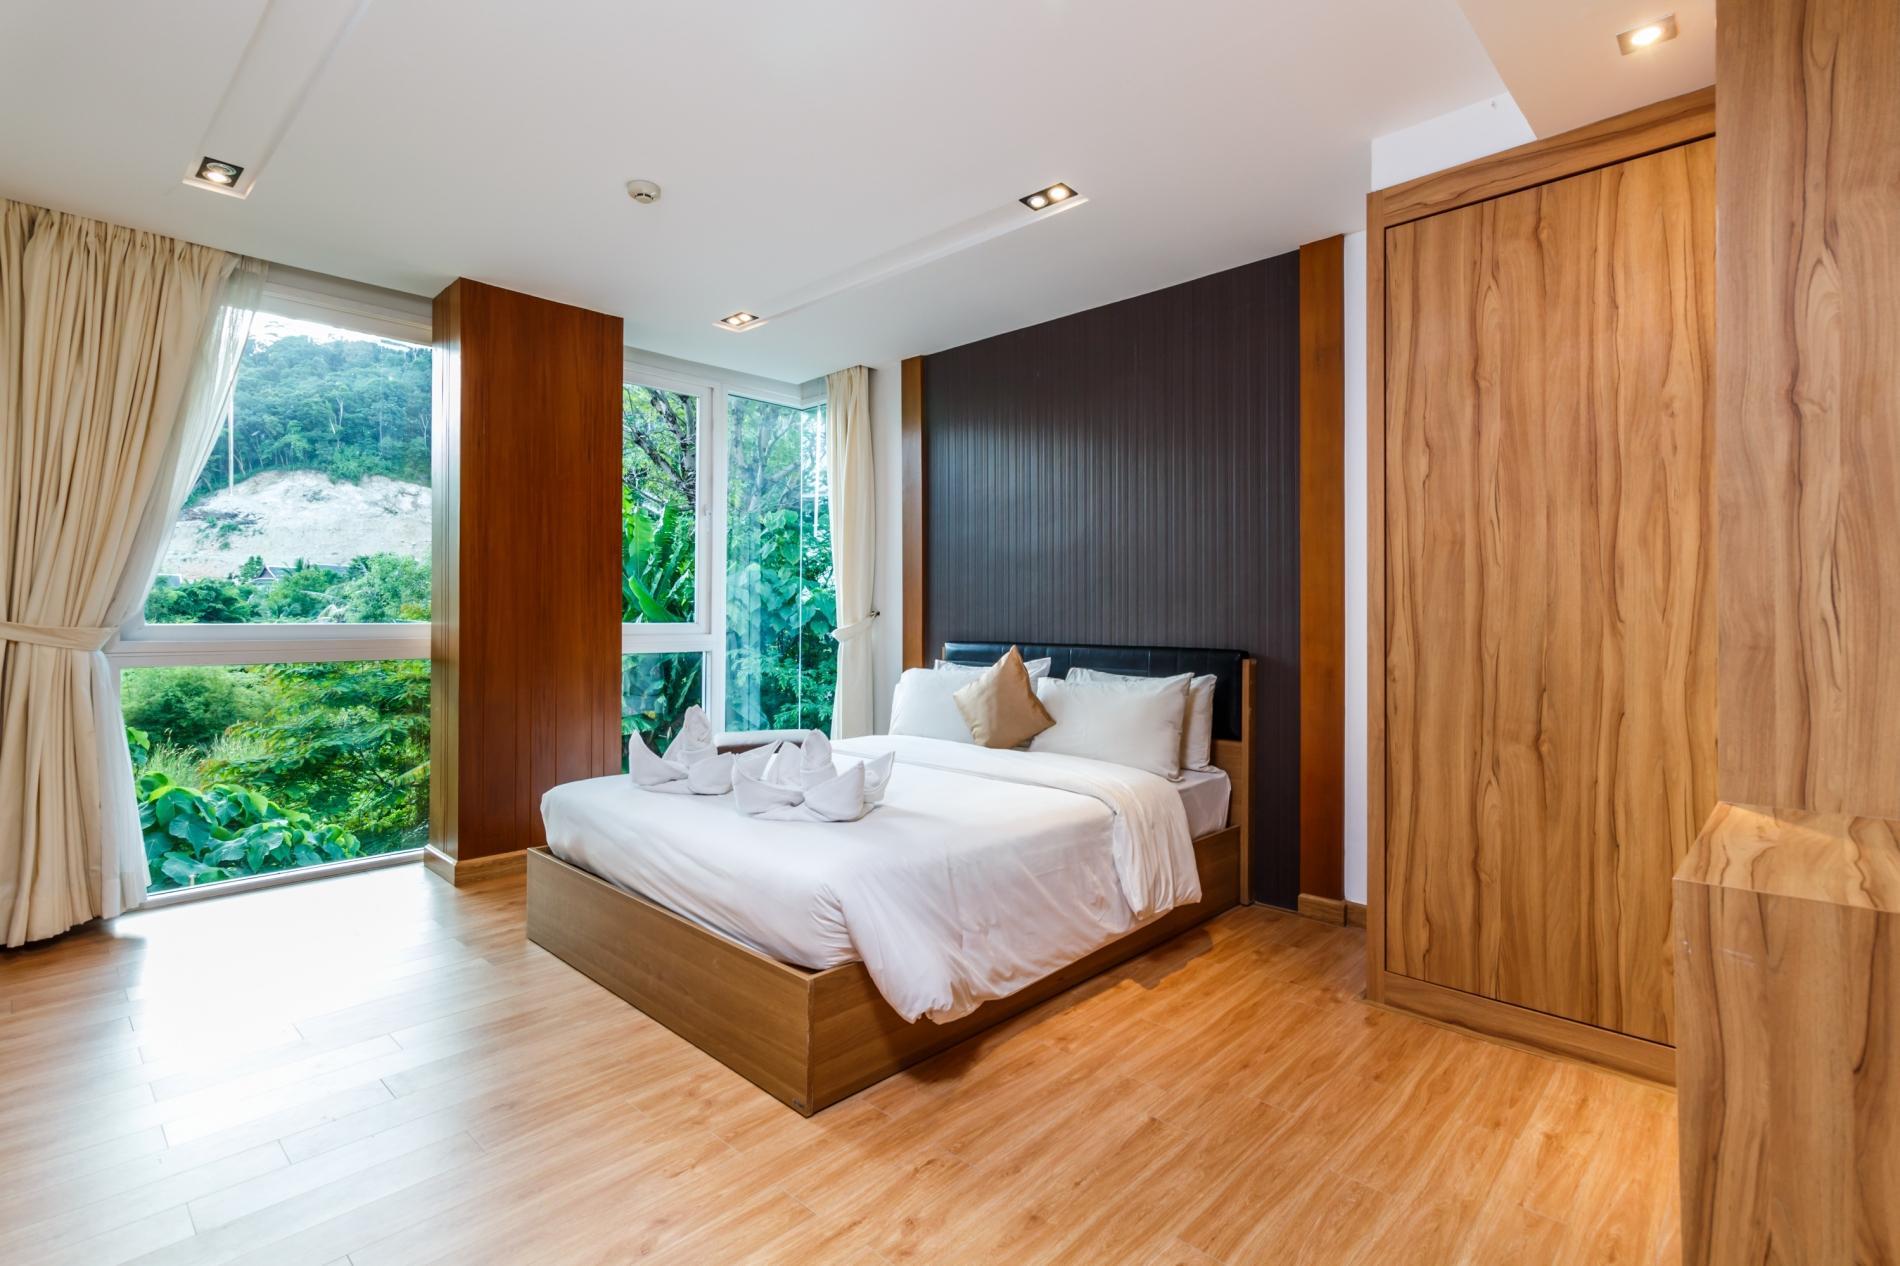 Apartment Privilege12 - Seaview 3 bedroom luxury apartment on Kalim bay photo 16965895